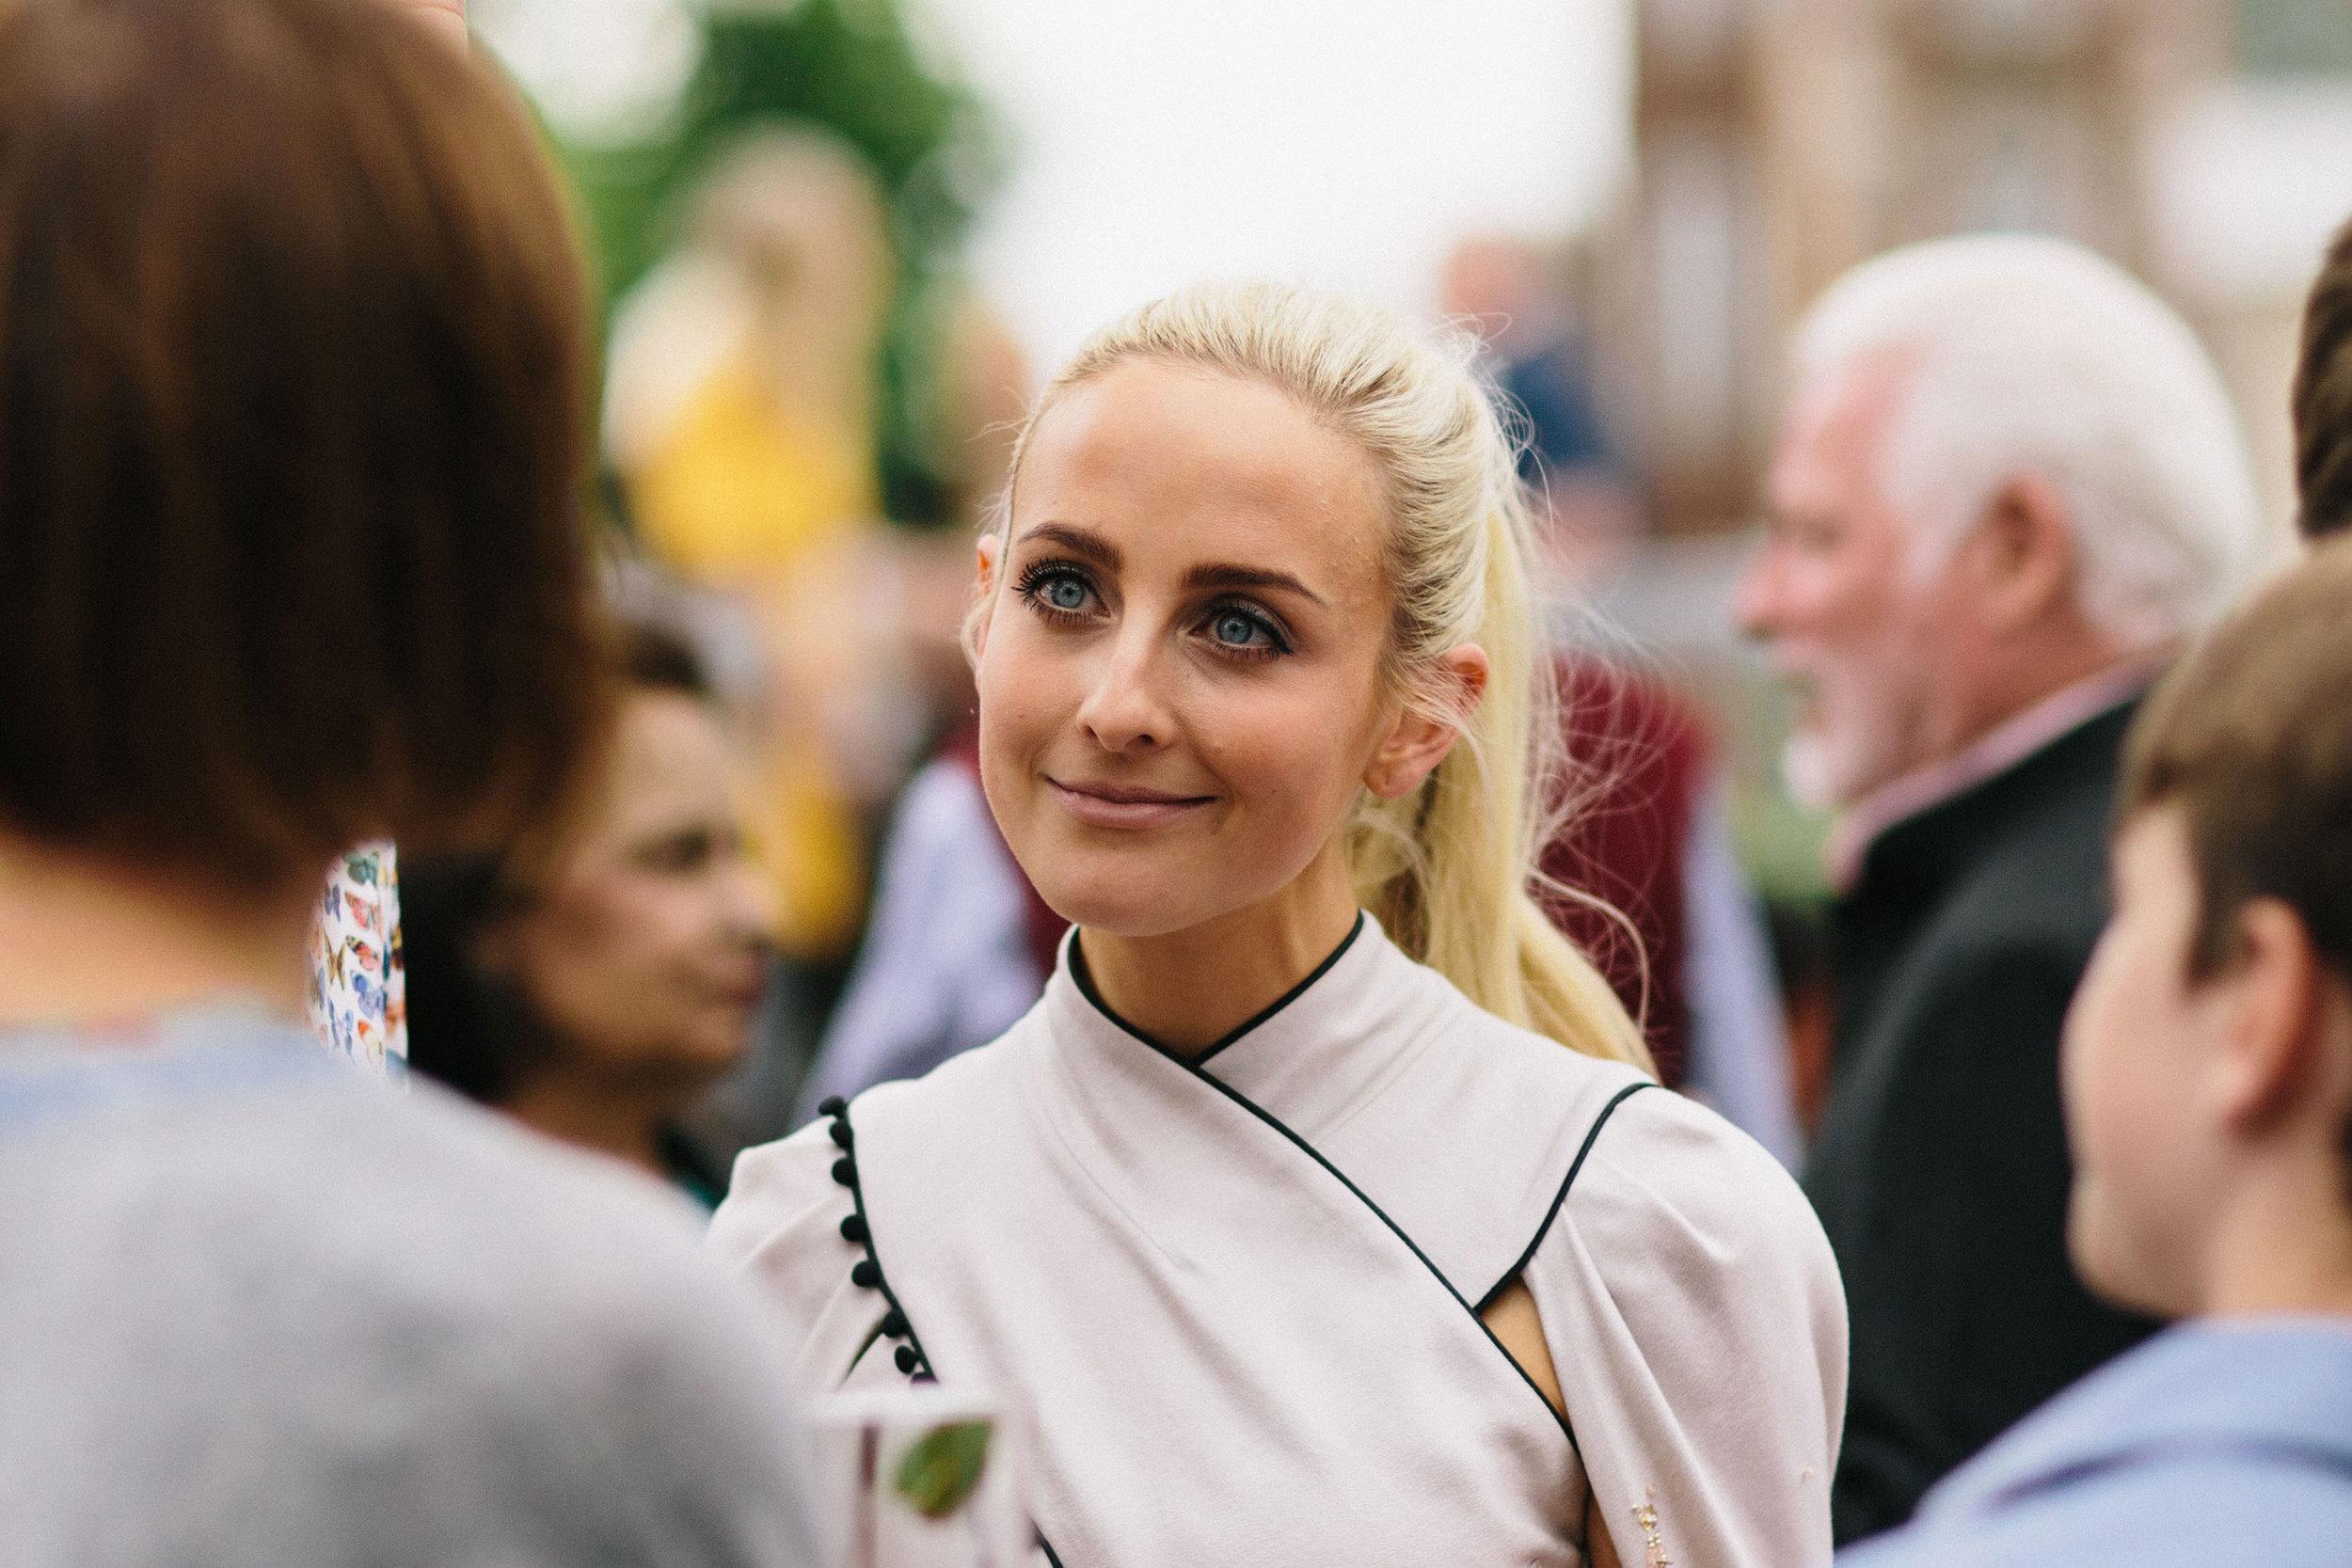 West-London-wedding-party-in-Ladbroke-Grove-Michael-Newington-Gray-22.jpg